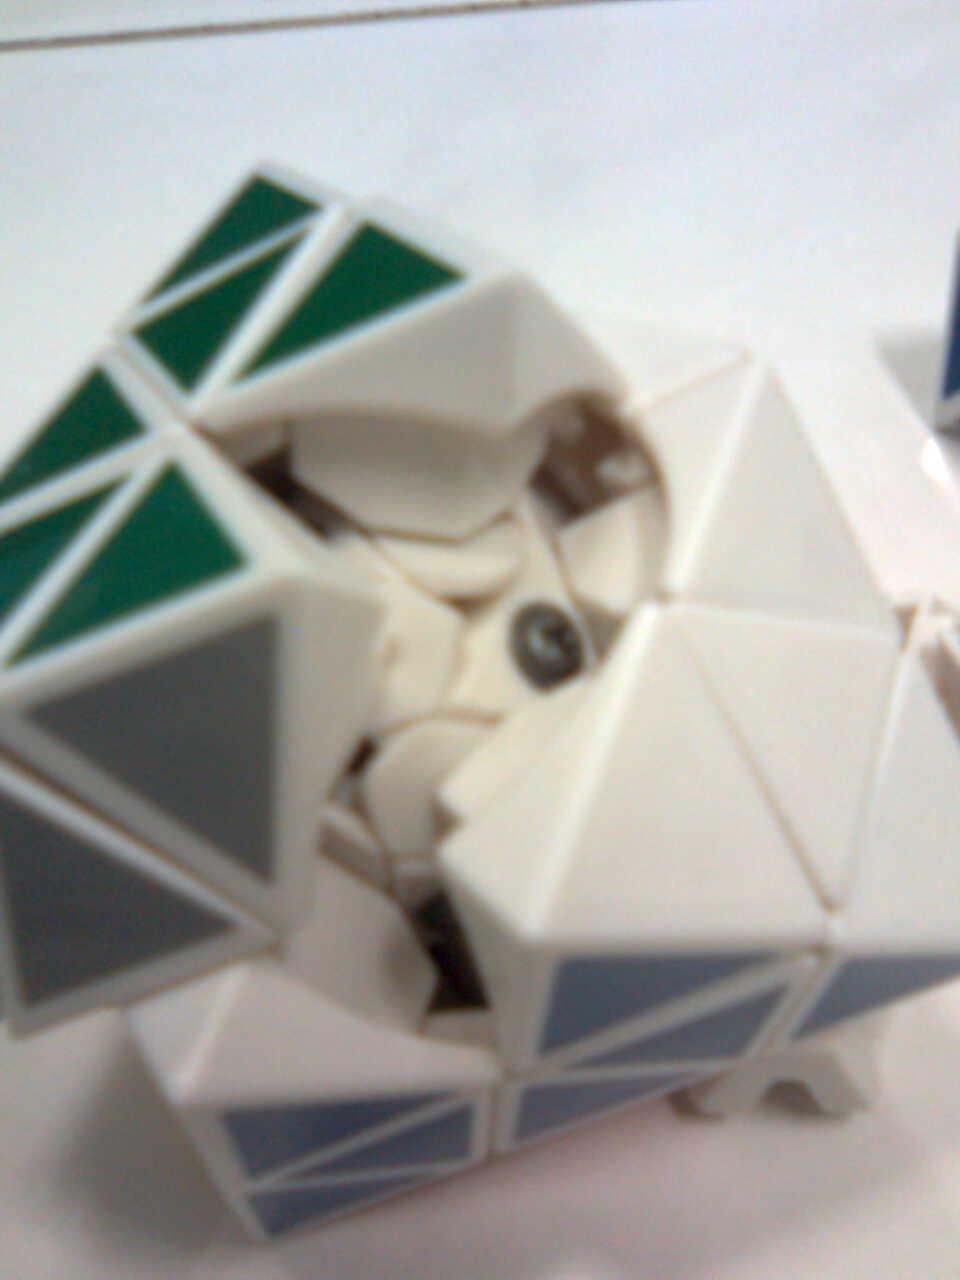 8 Sides!-The Turning Face Octahedron Mechanism